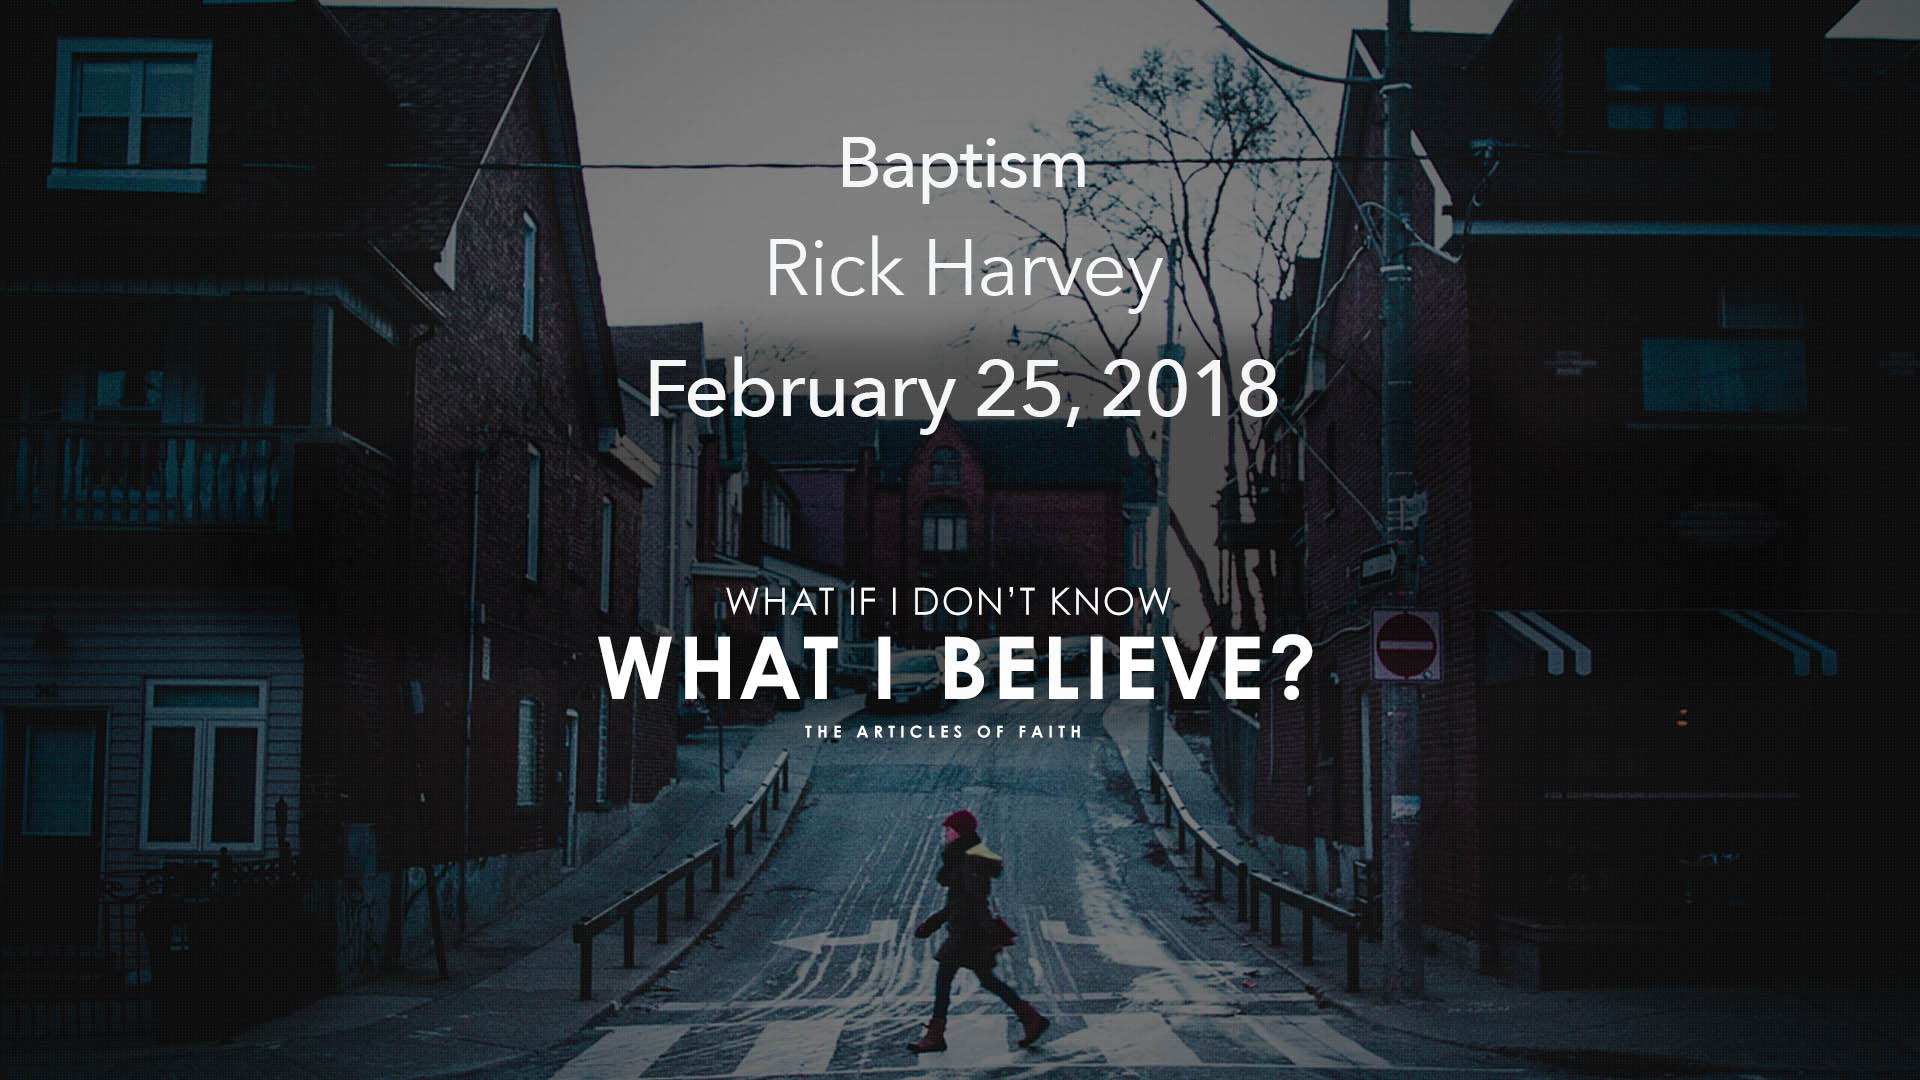 Believe2018_Vimeo_Feb25.jpg